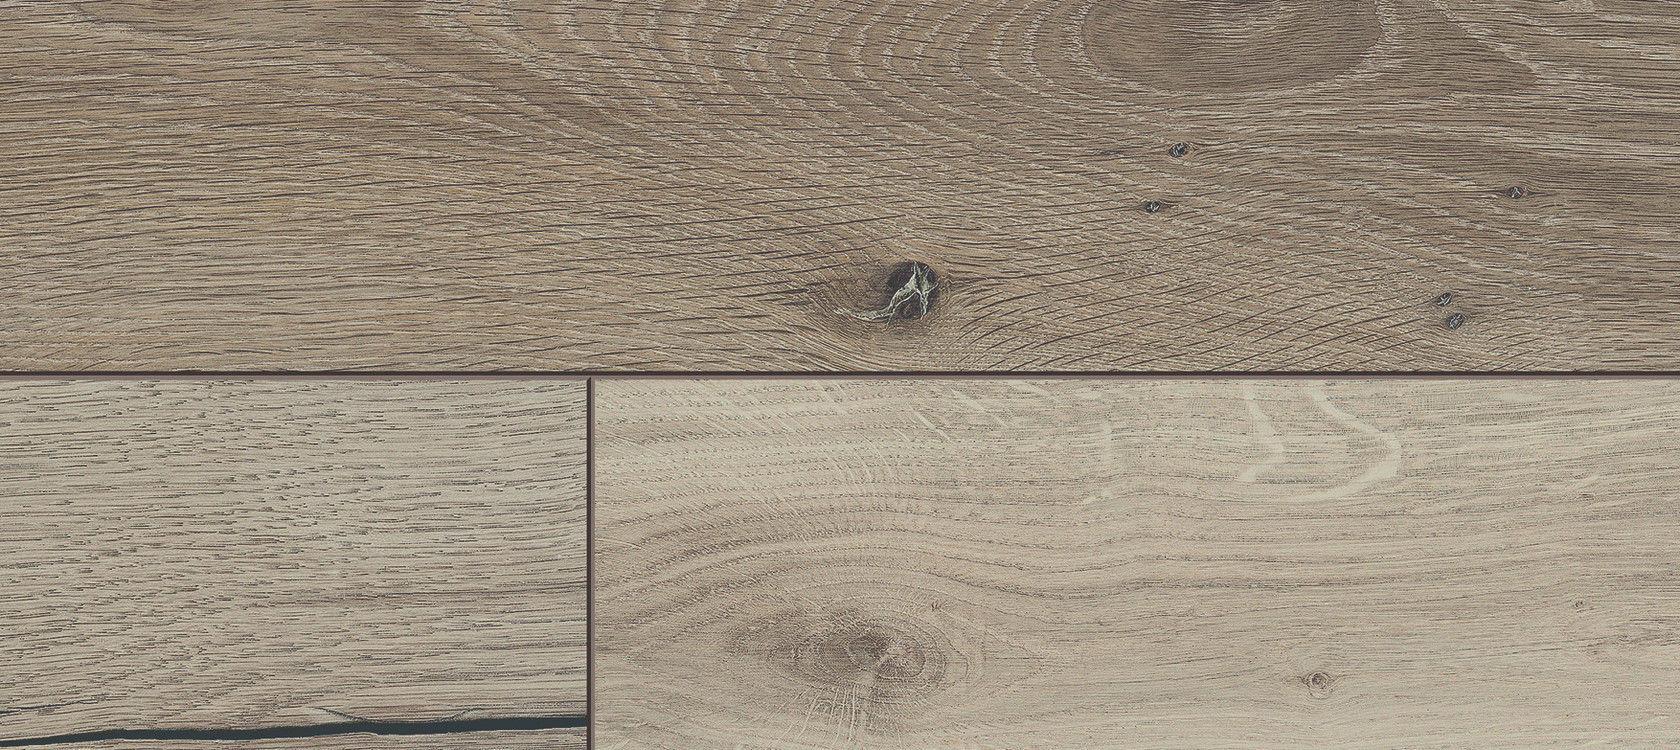 Natural cork flooring commercial tile high gloss oak avis natural cork flooring commercial tile high gloss oak avis sp20 kaindl dailygadgetfo Gallery